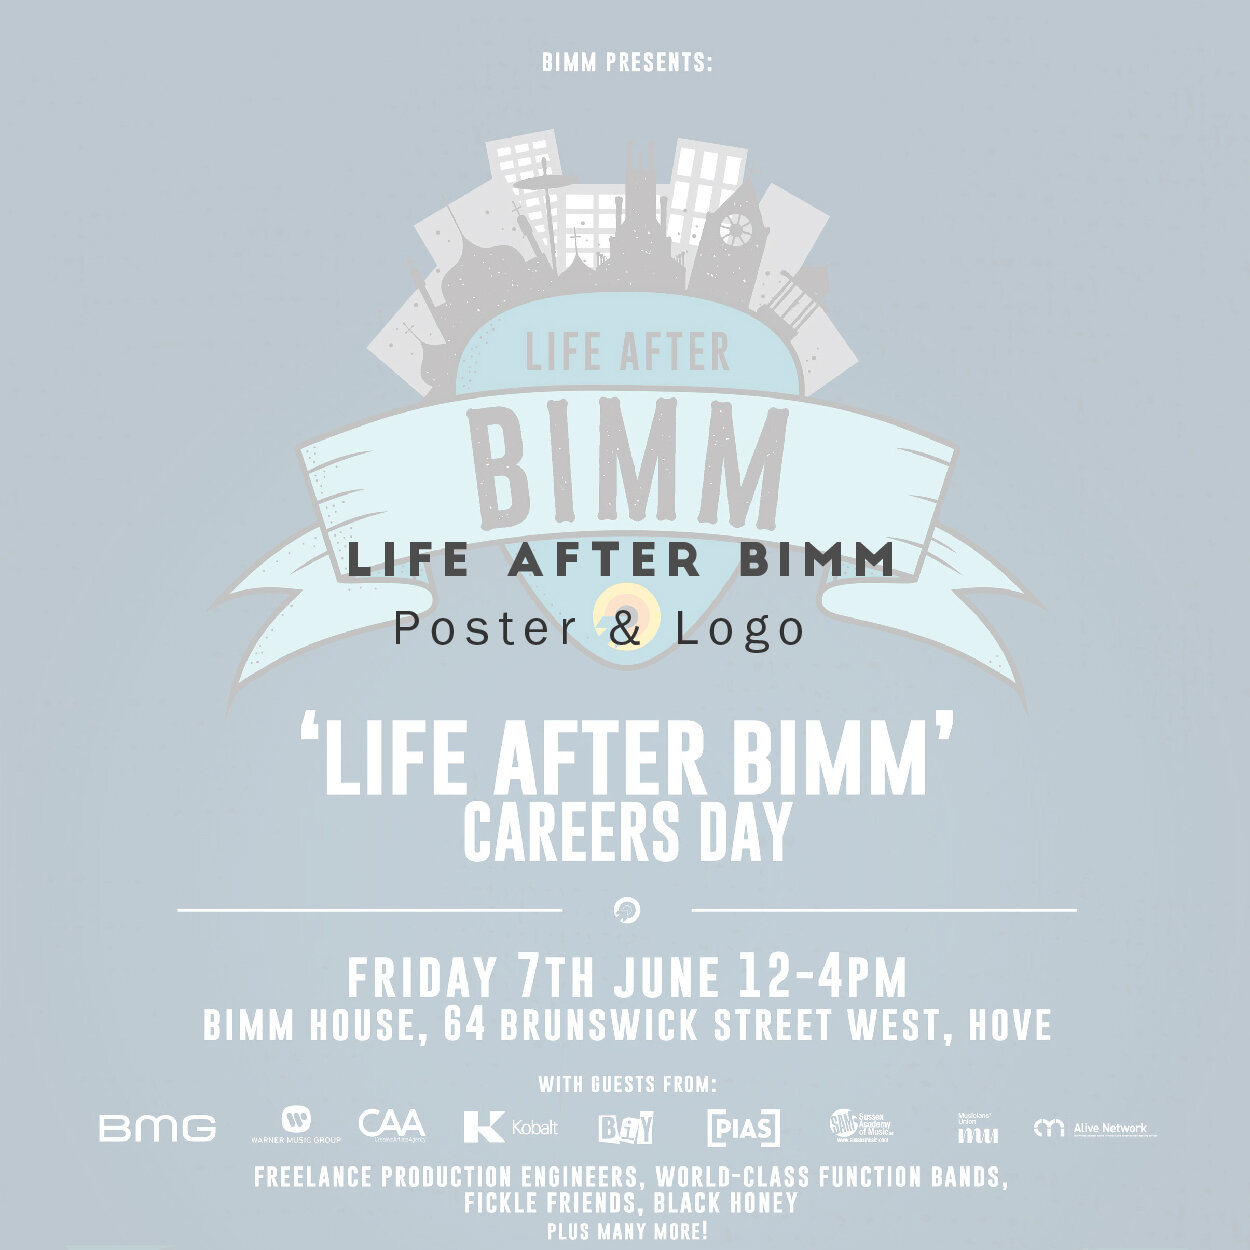 Life After BIMM